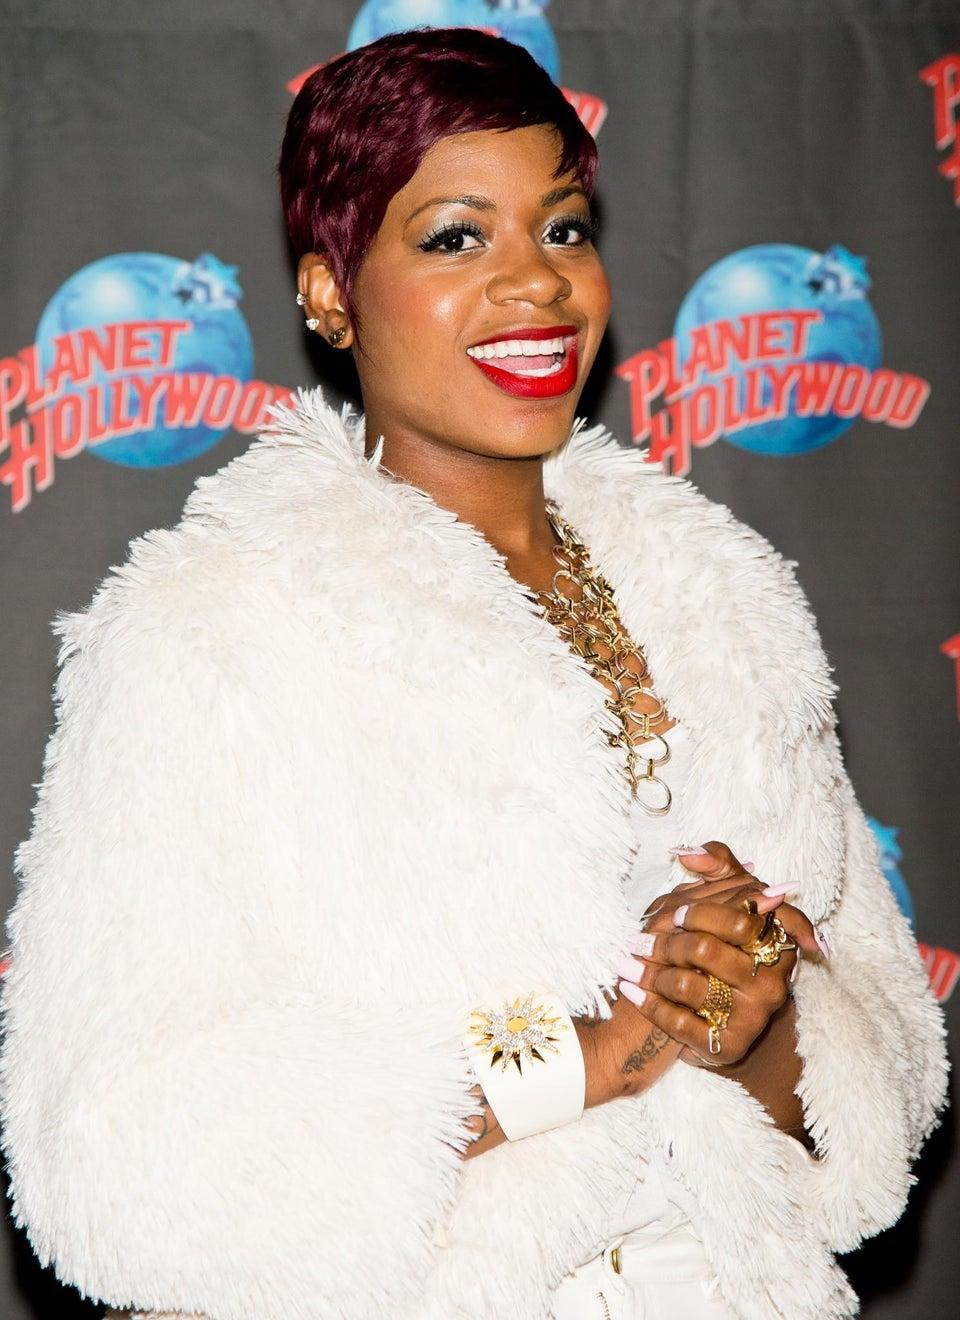 Fantasia Returns to Broadway in Jazz-Inspired Musical